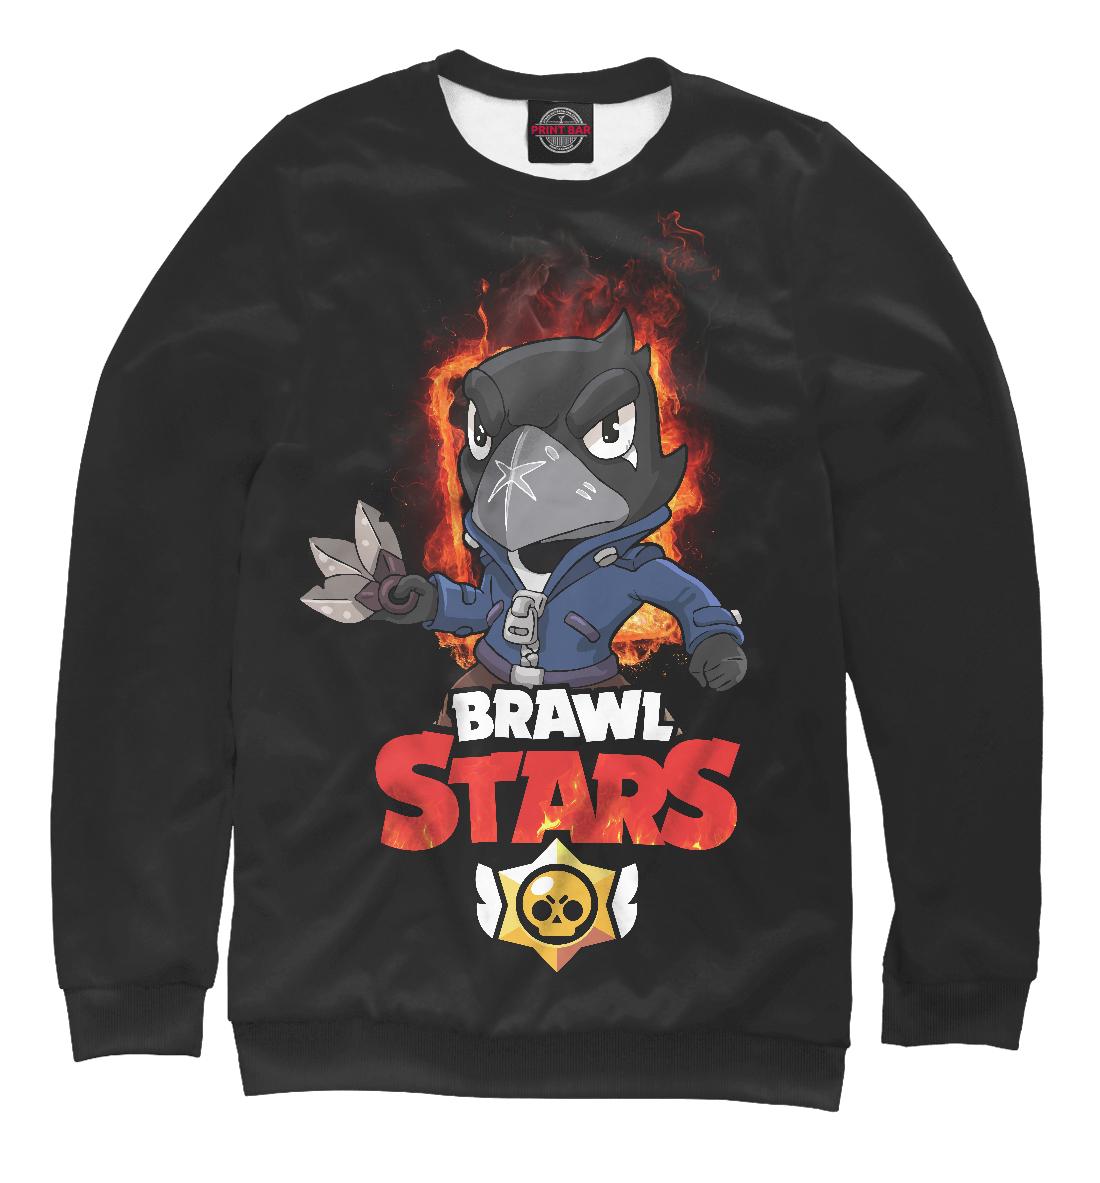 Crow Brawl Stars детская футболка 3d brawl stars crow 128